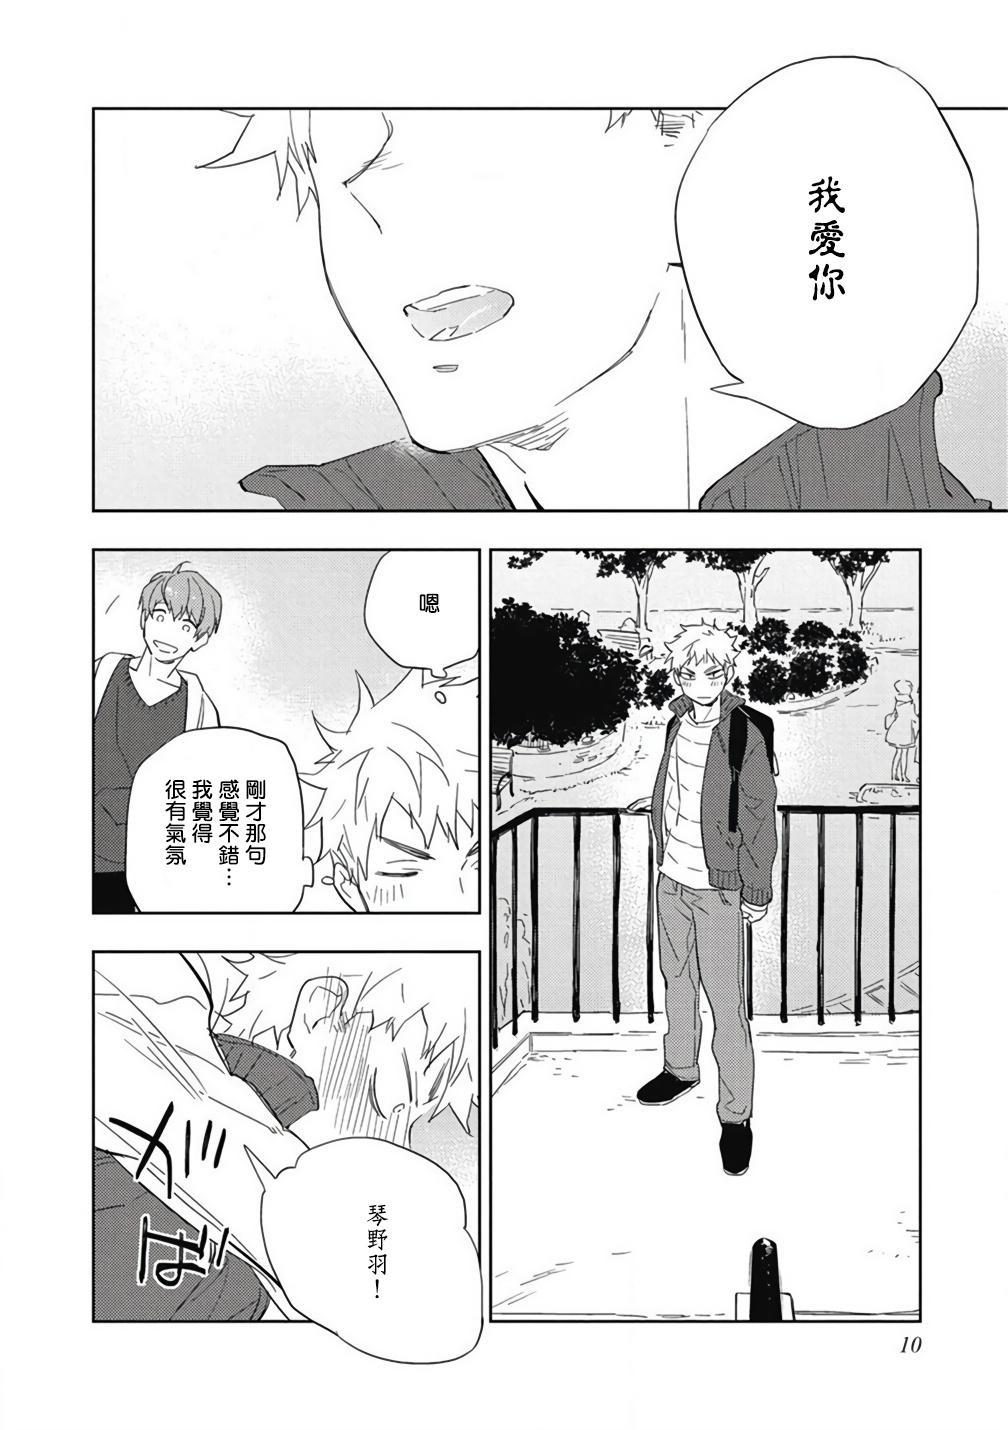 Kimi to Oishii Ai no Kotonoha | 与你一起享用的美味情话 Ch. 1-2 10